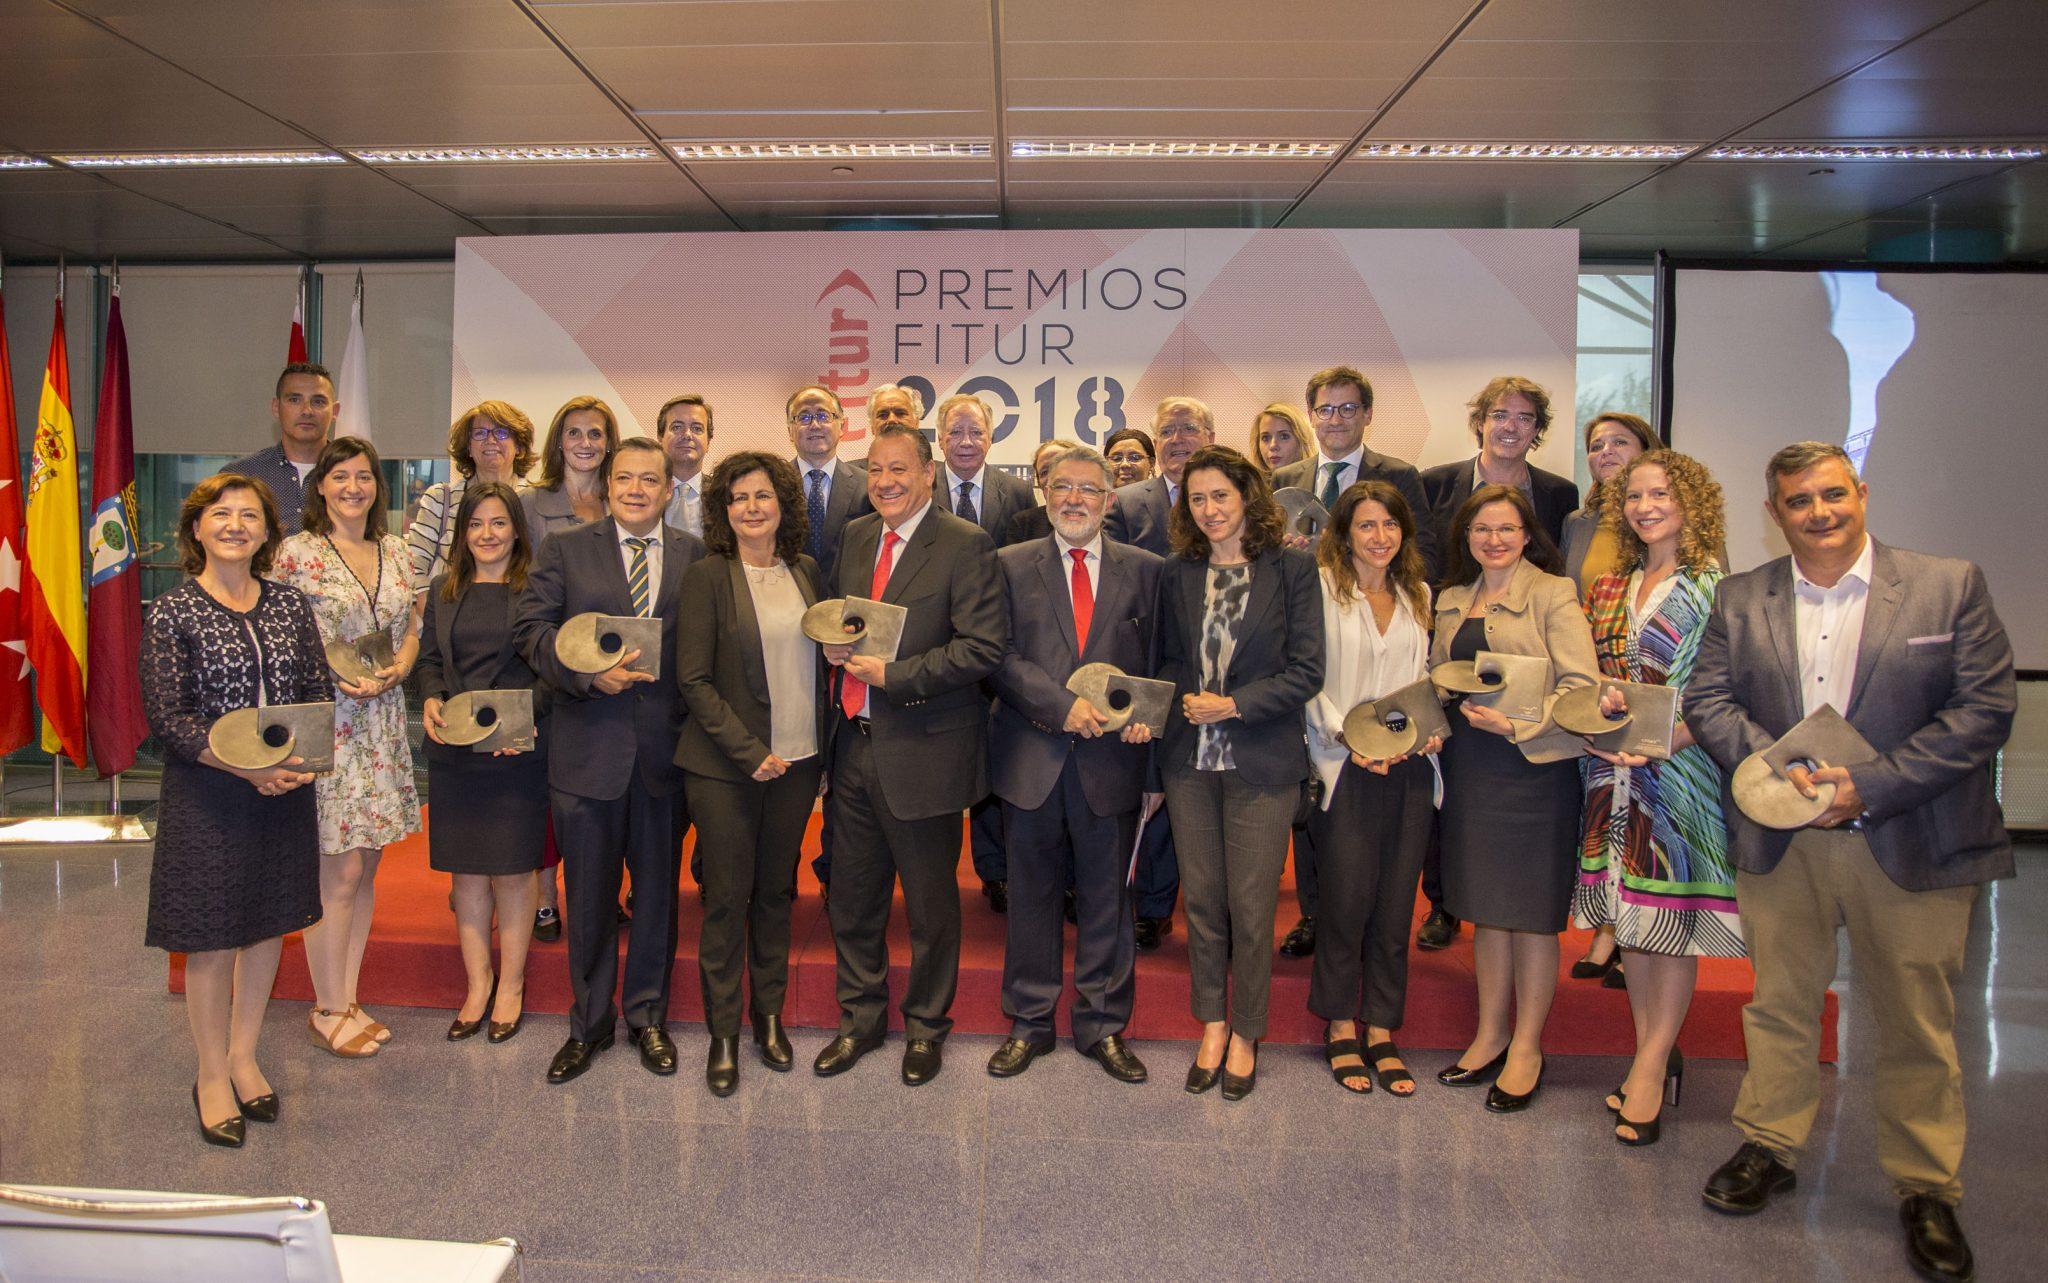 Foto de la entrega de Premios FITUR 2018